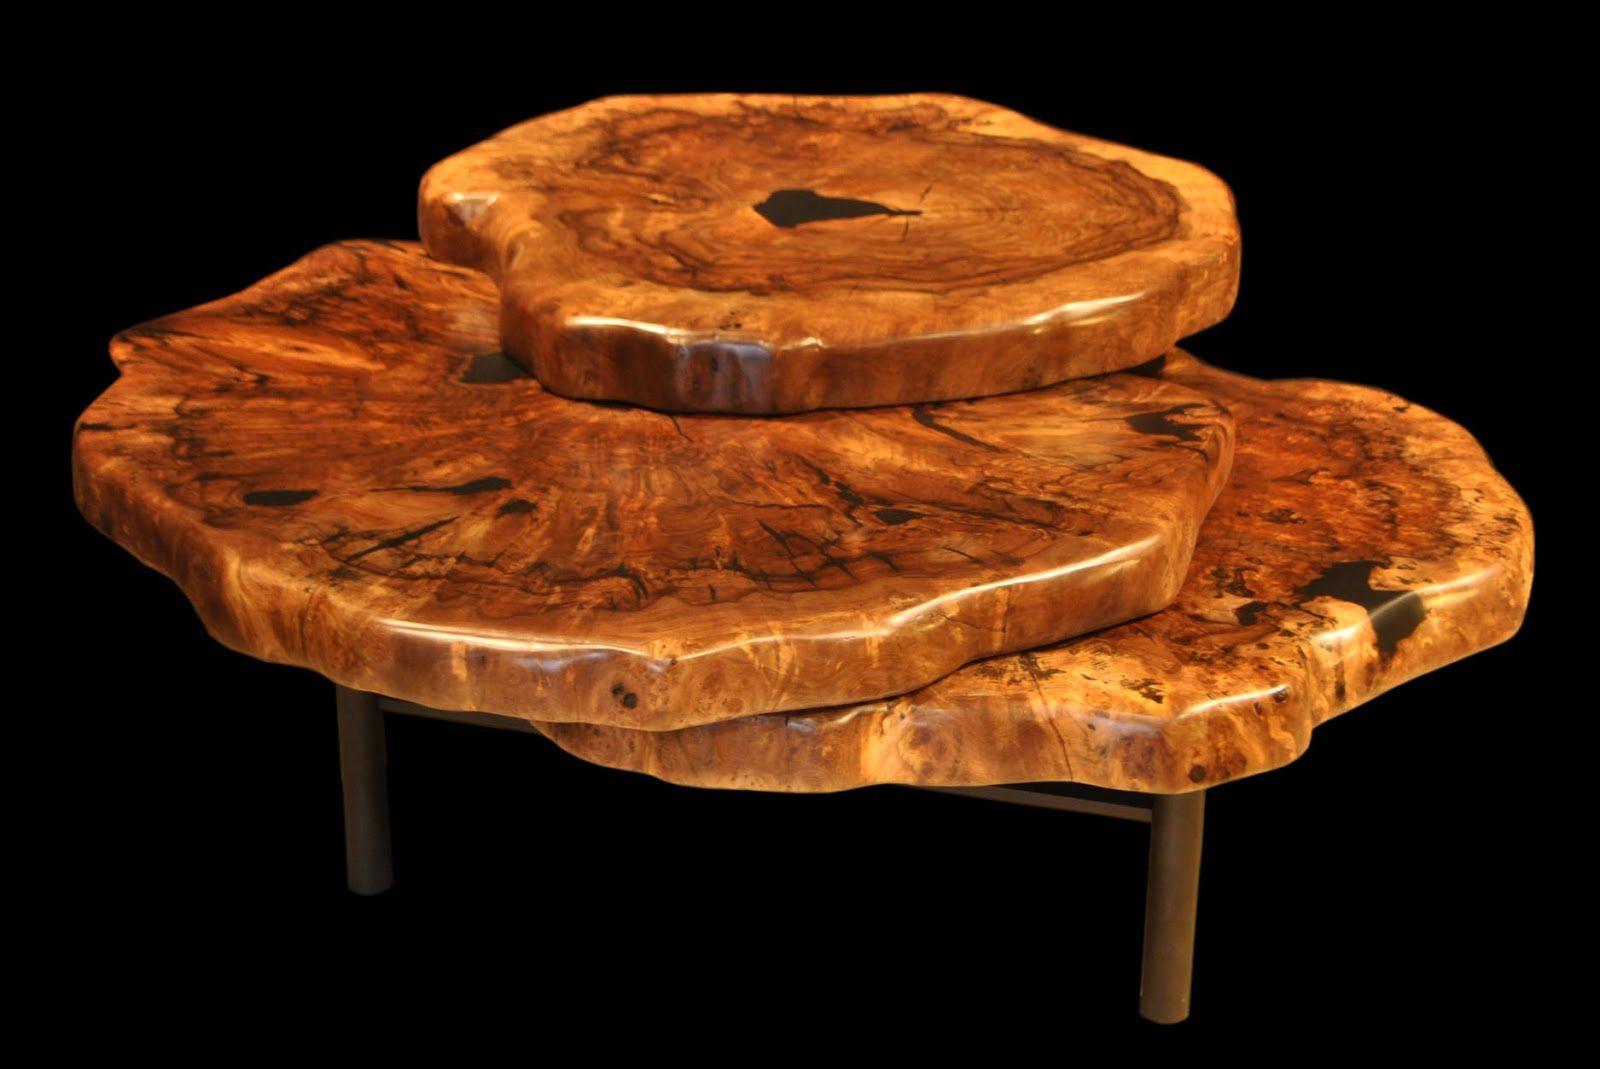 CLARK Functional Art Slab Tables Pinterest Clarks Woods and